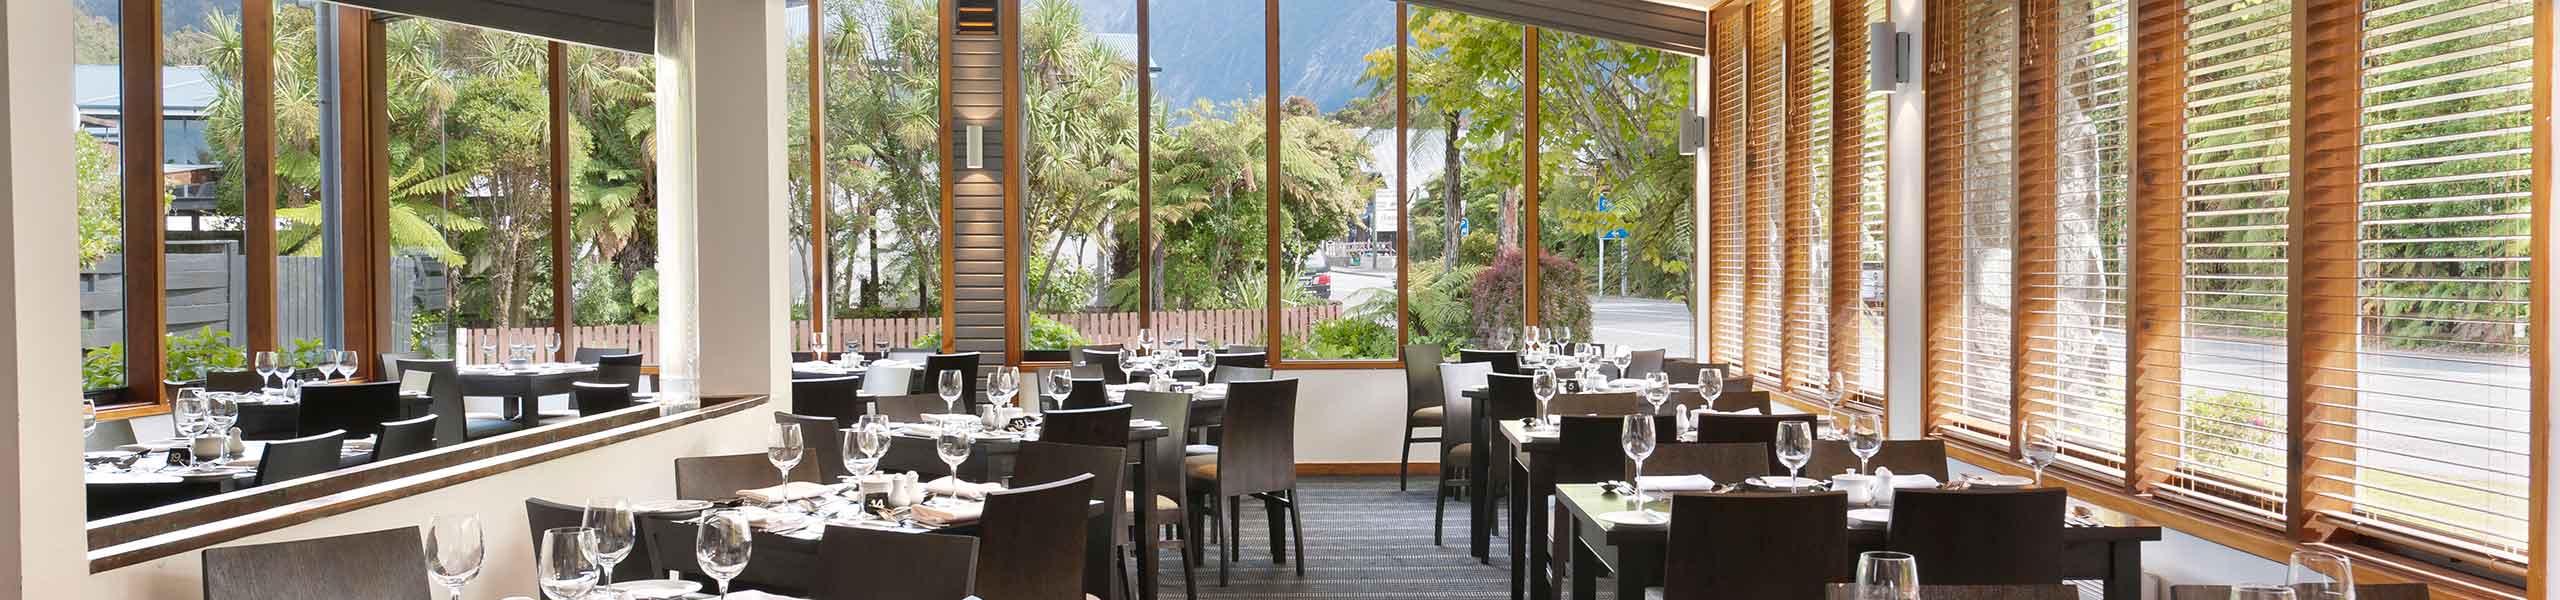 Scenic Hotel Franz Josef Glacier Restautant